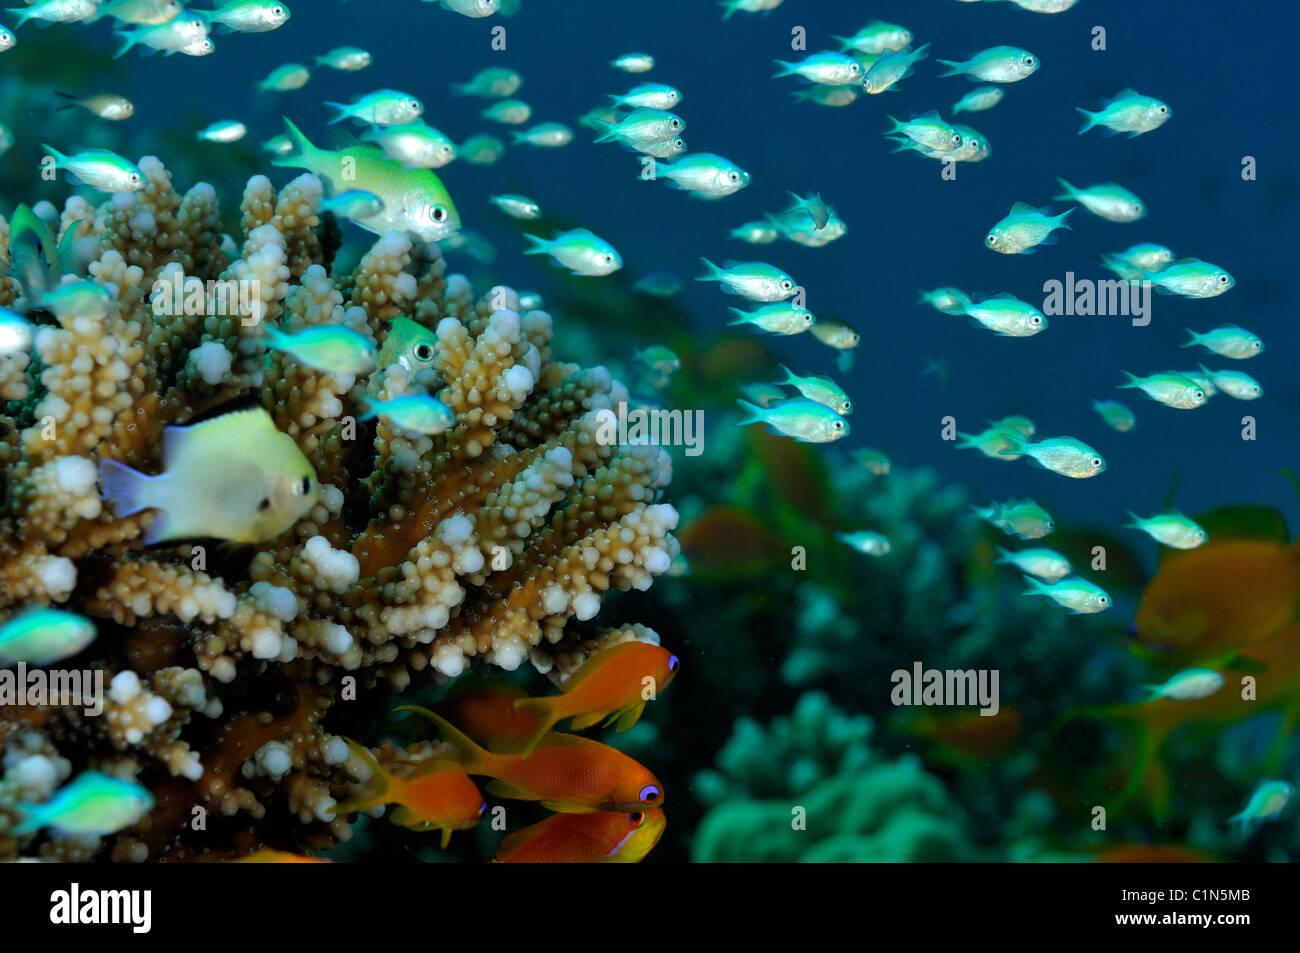 Bluegreen chromis fish, Chromis viridis, aggregation on Acropora lamarcki coral - Stock Image